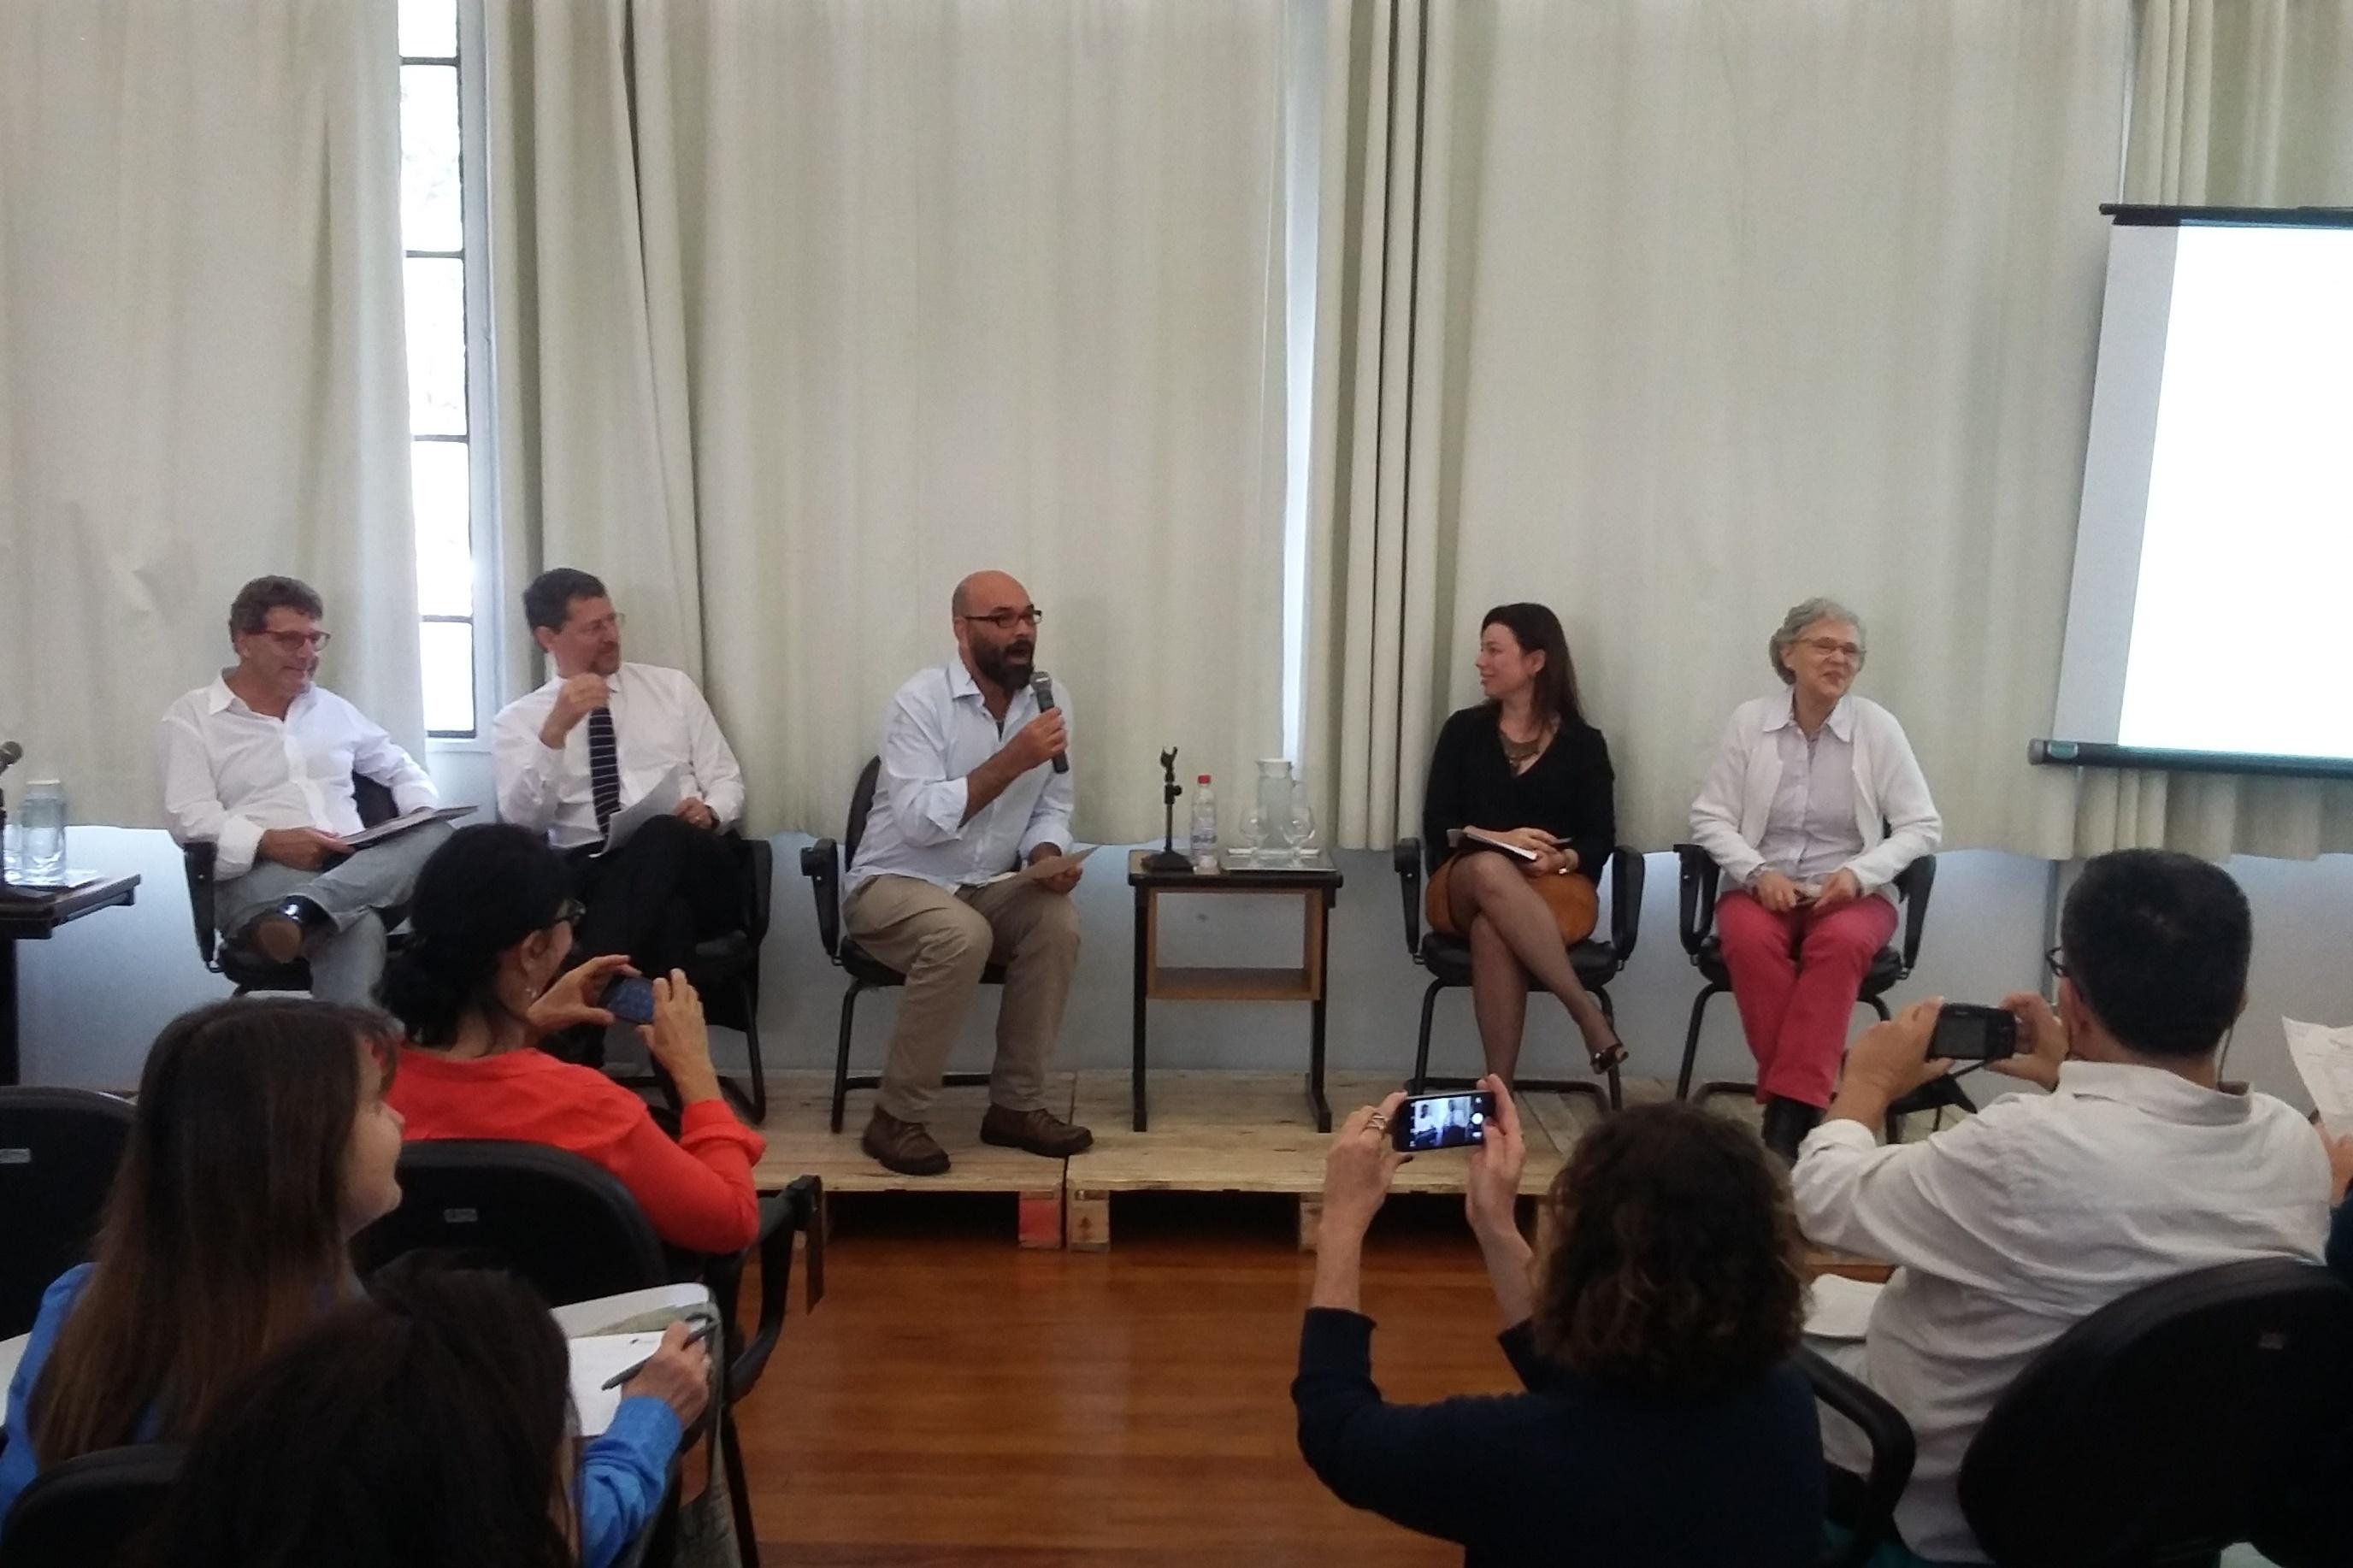 Da esquerda para a direita: Vereador Nabil Bonduki, Dr. Wladimir Ribeiro, Jetro Menezes, Dra. Alexandra Faccioli, Nina Orlow